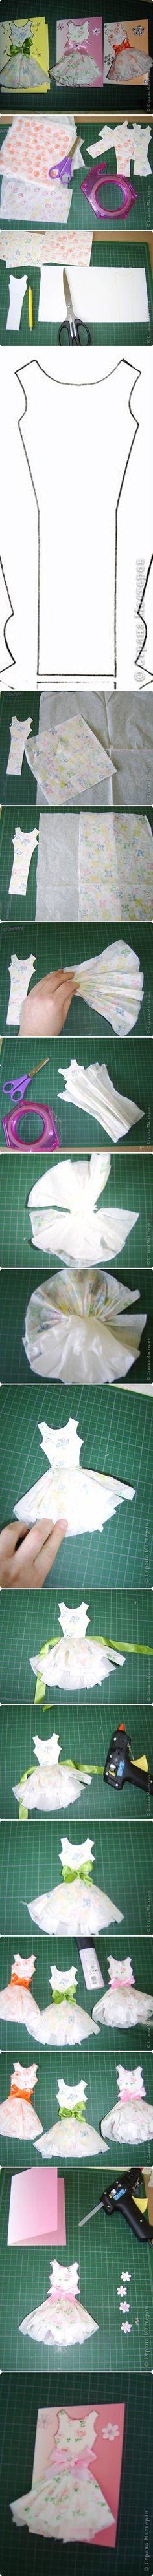 DIY Paper Dress Card Topper dress paper diy easy craftsb